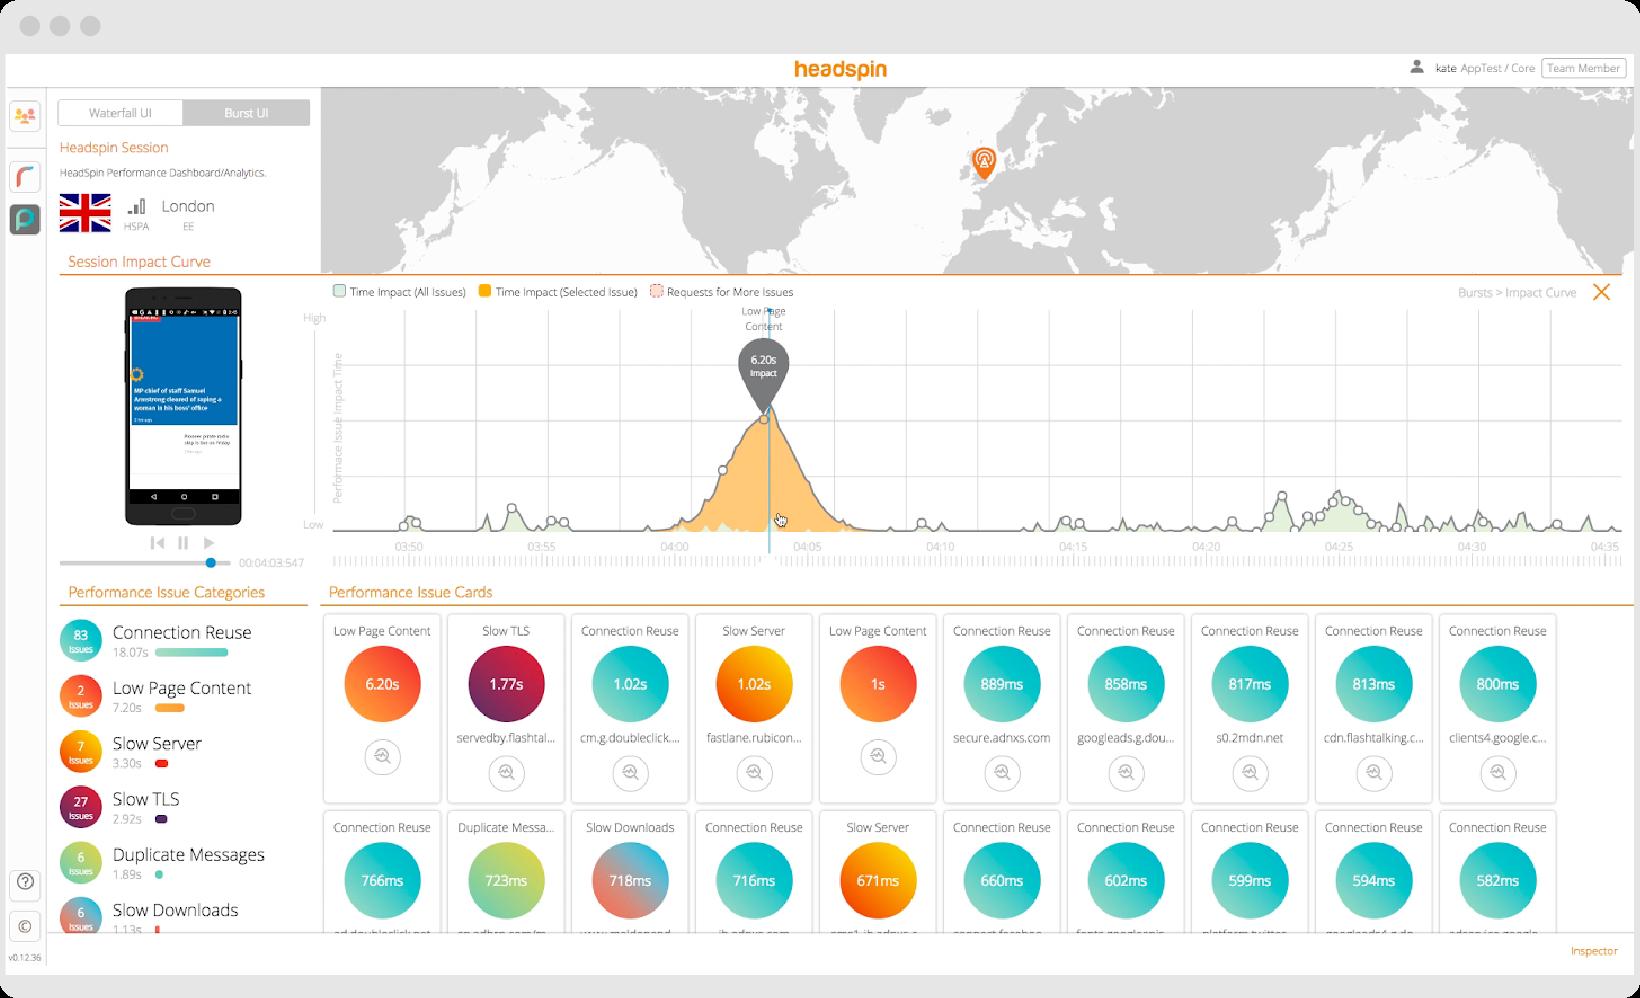 HeadSpin Software - HeadSpin key performance indicators (KPIs)